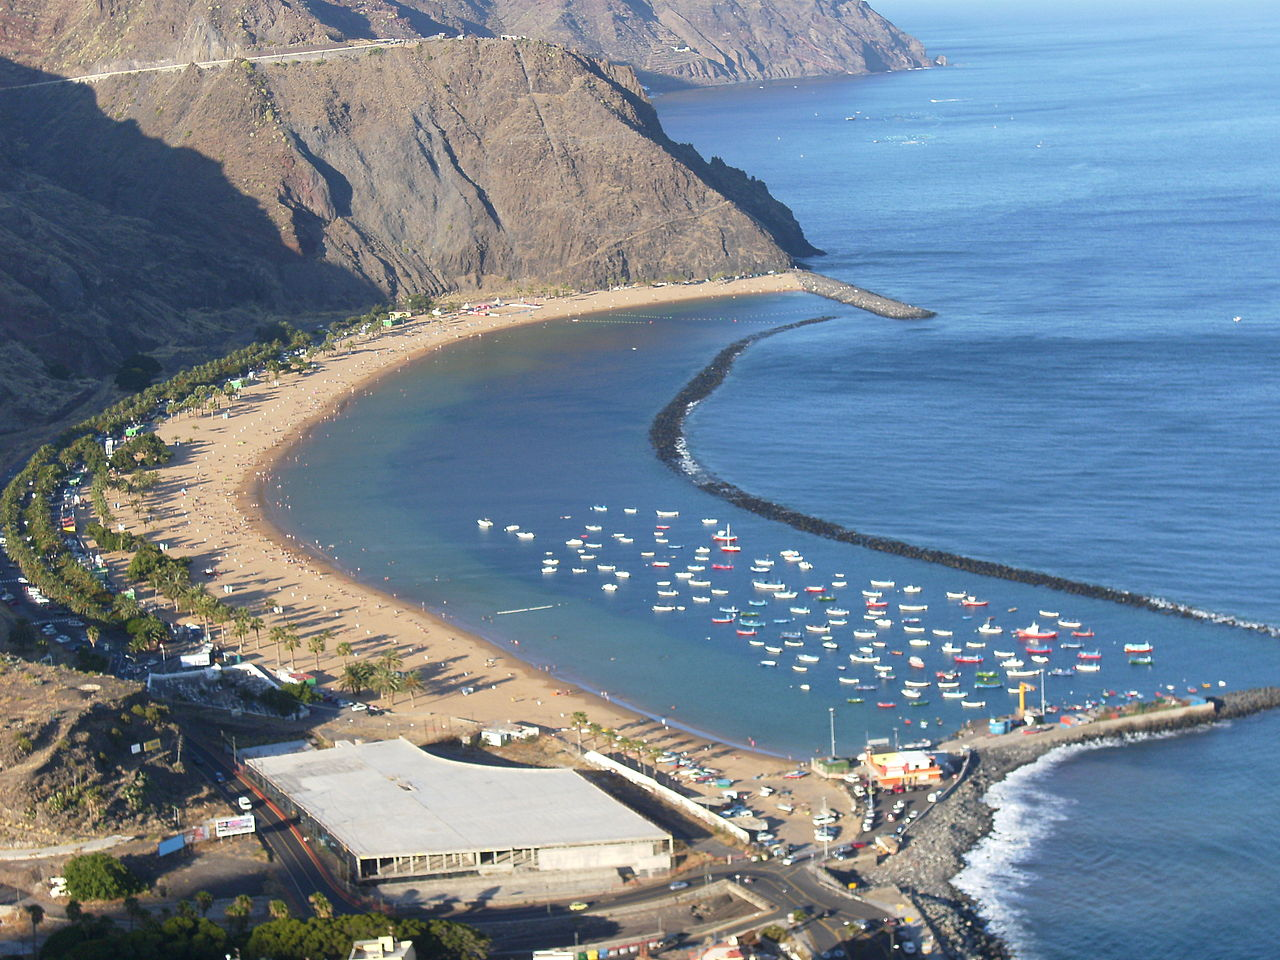 Пляж Лас-Тереситас рядом с городом Санта-Крус-де-Тенерифе